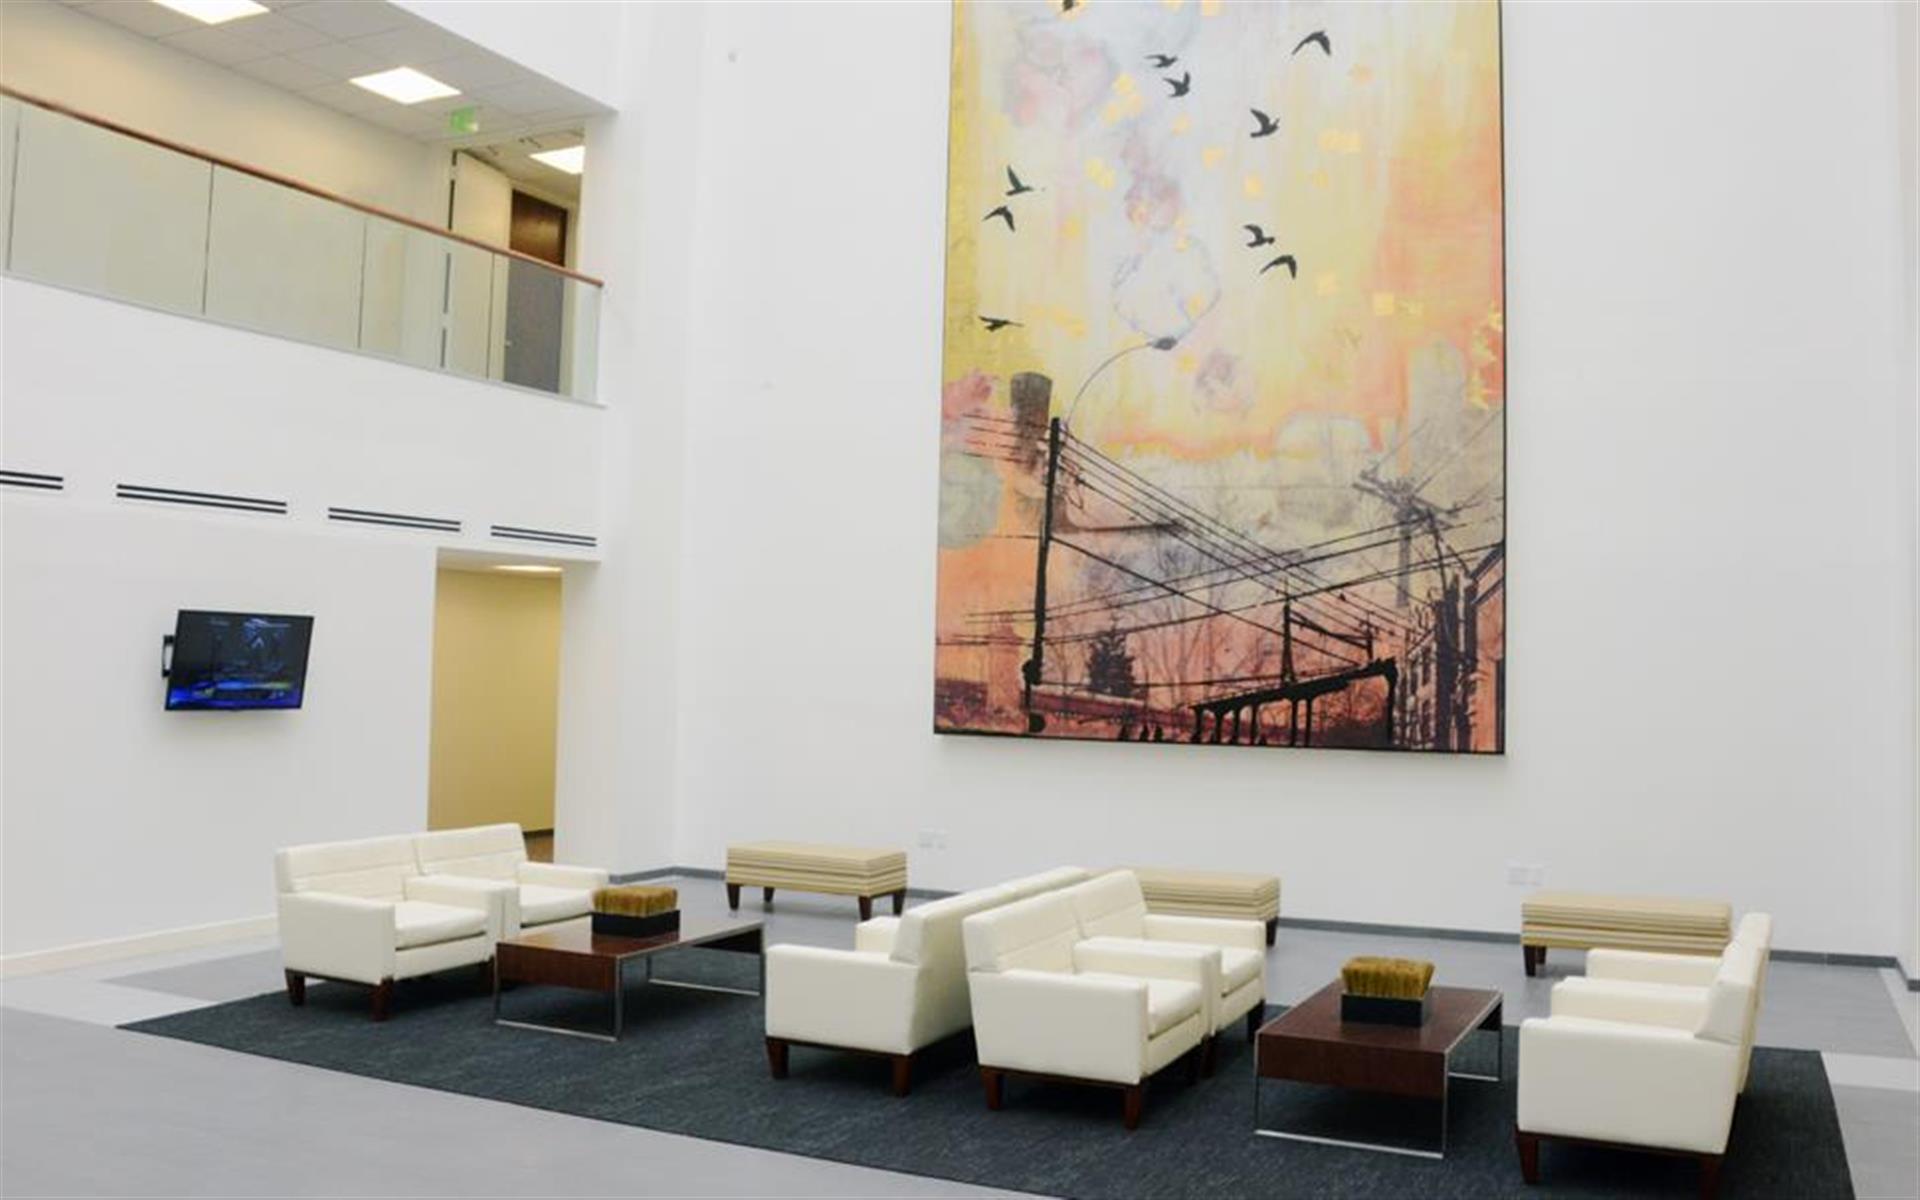 CORPORATE EXECUTIVE OFFICES - Atrium Meeting Space